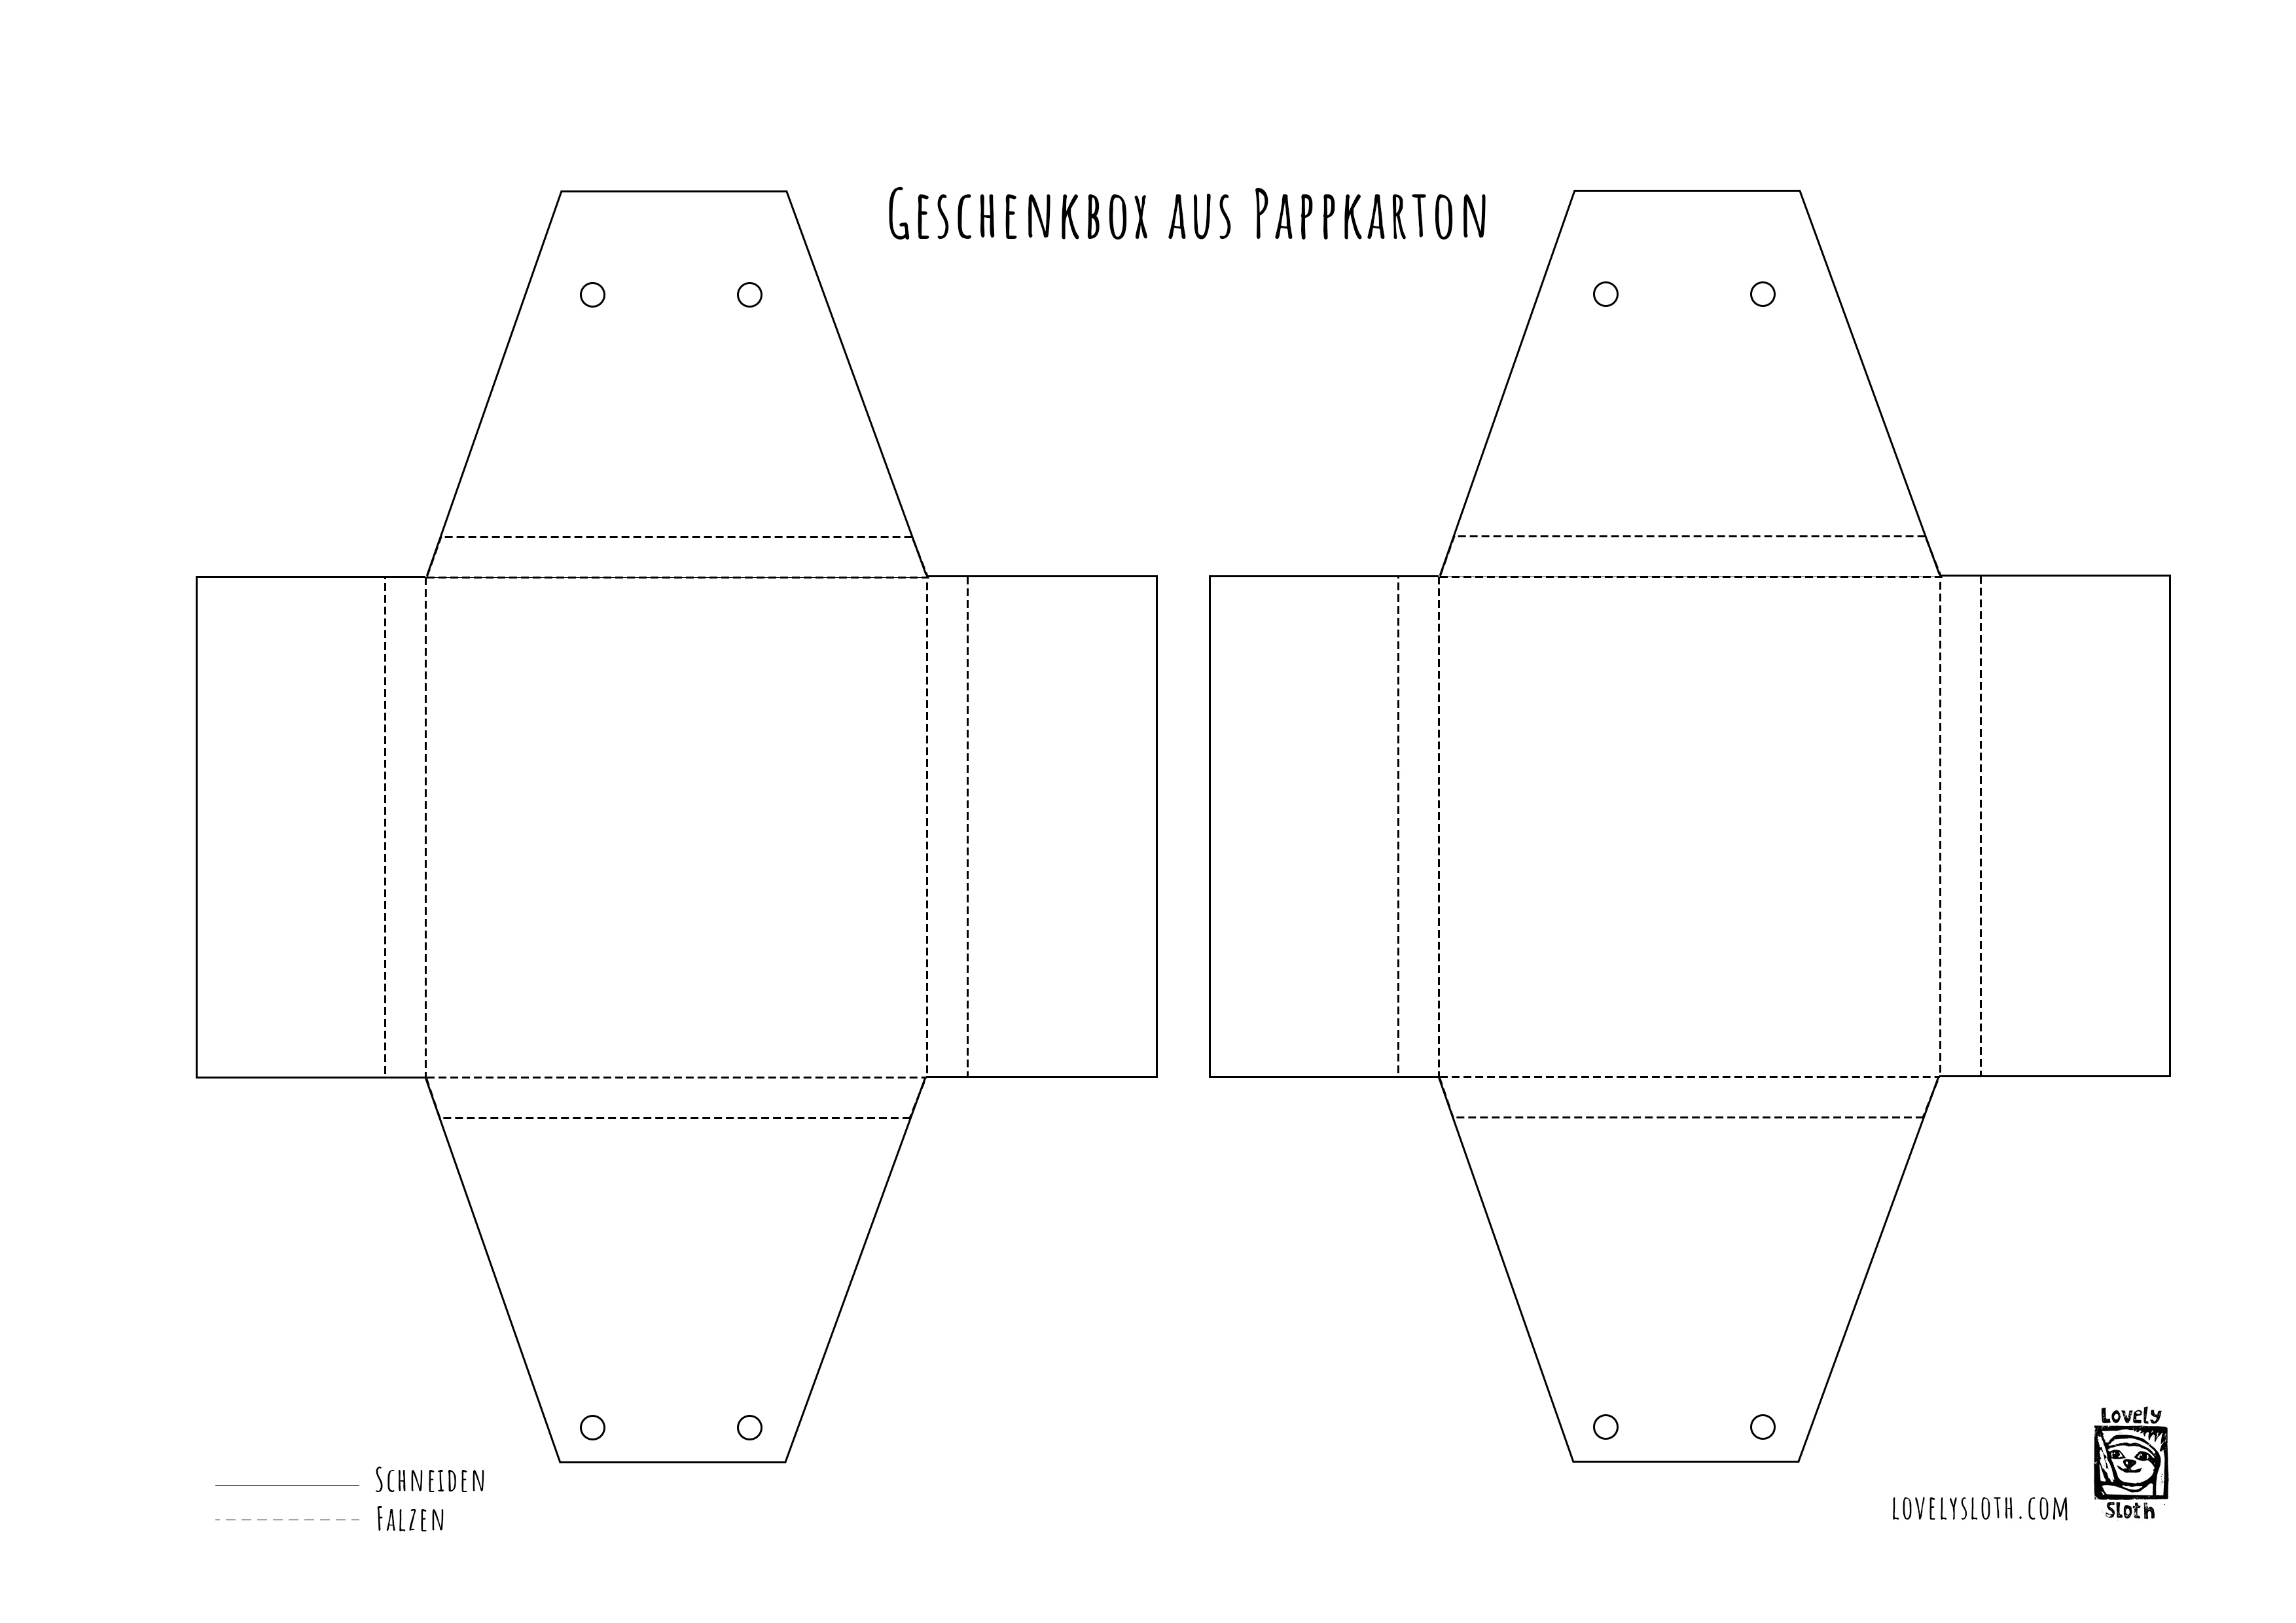 Berühmt Geschenkbox basteln anleitung – Europäische Weihnachtstraditionen &UX_09